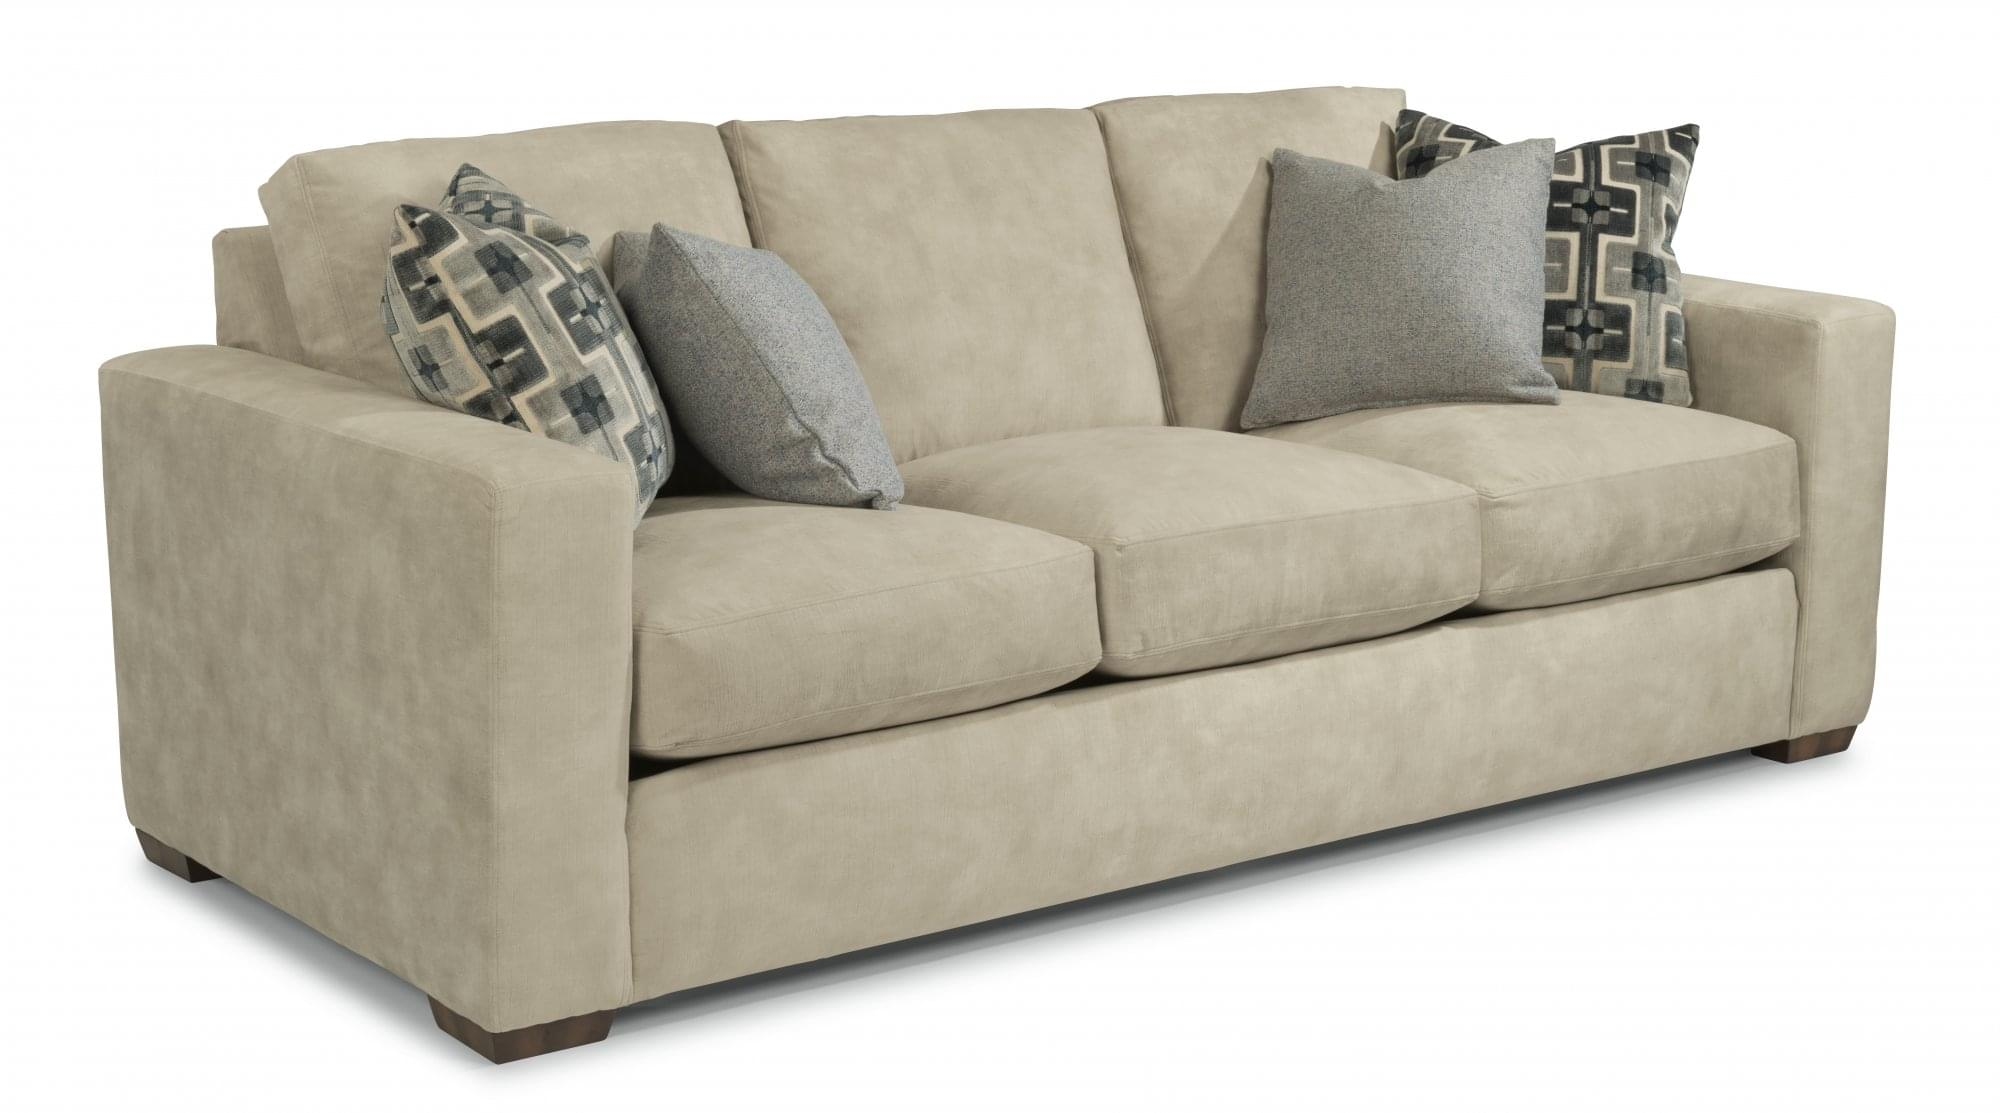 Flexsteel Collins sofa at Mums Place Furniture Monterey CA